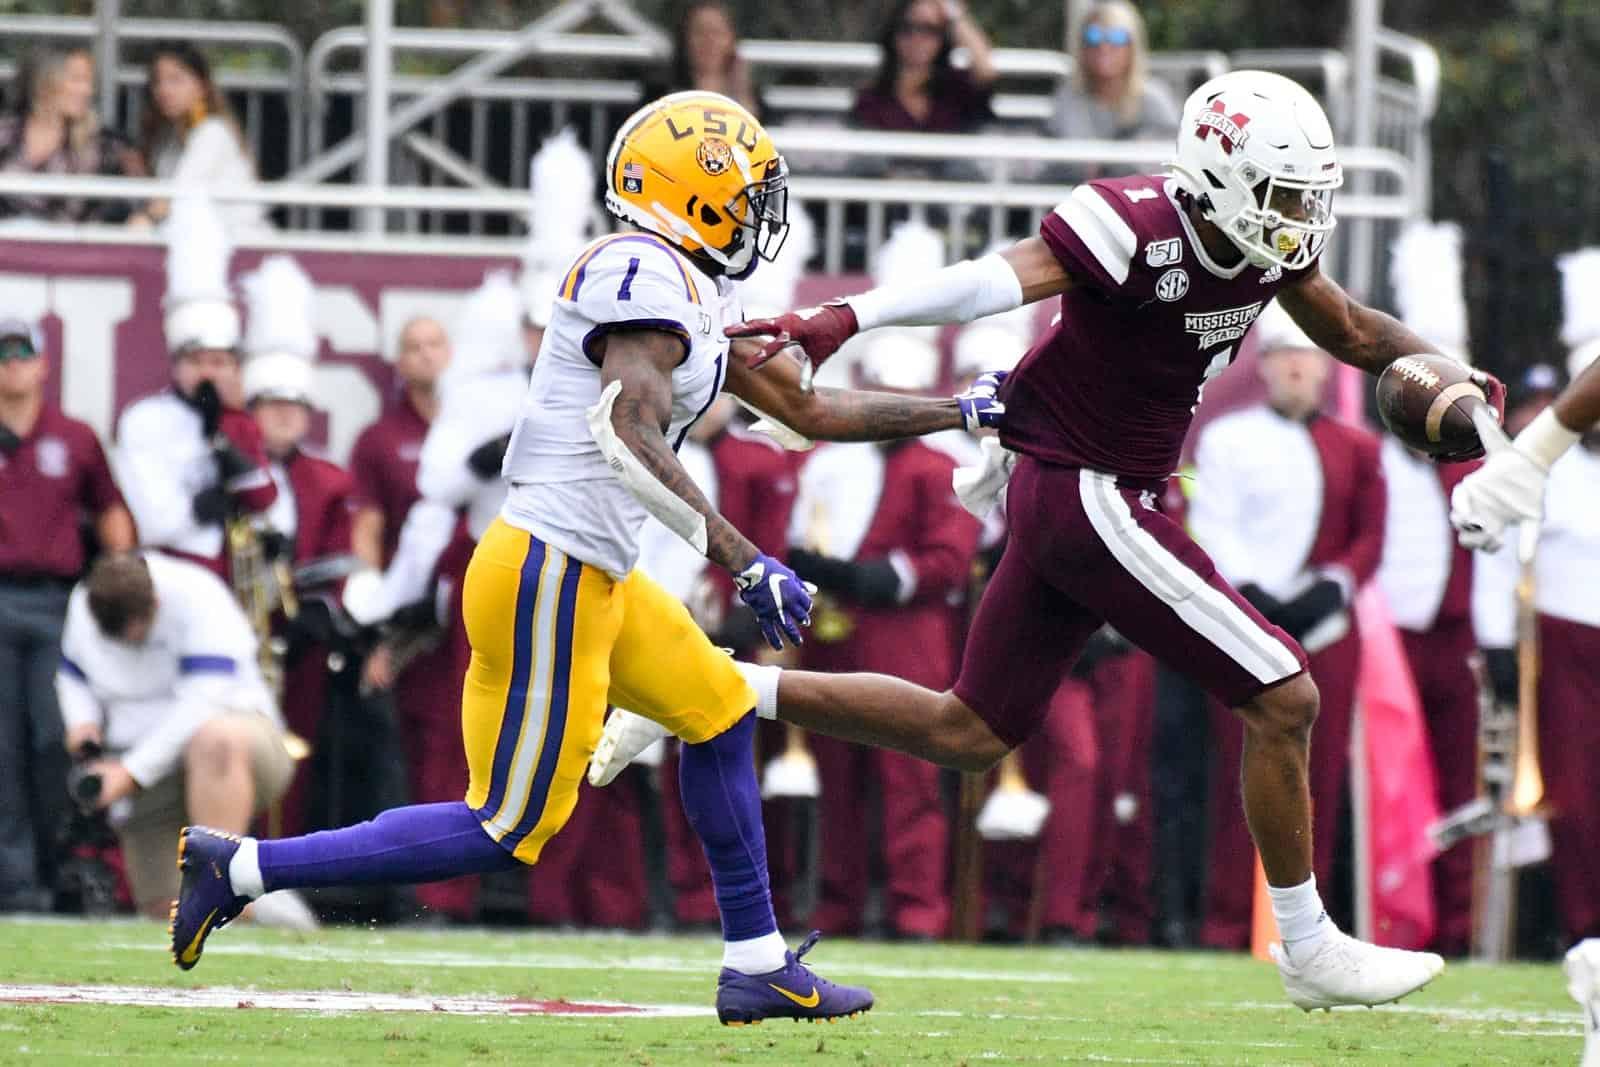 2021 SEC Football Predictions | Week 4